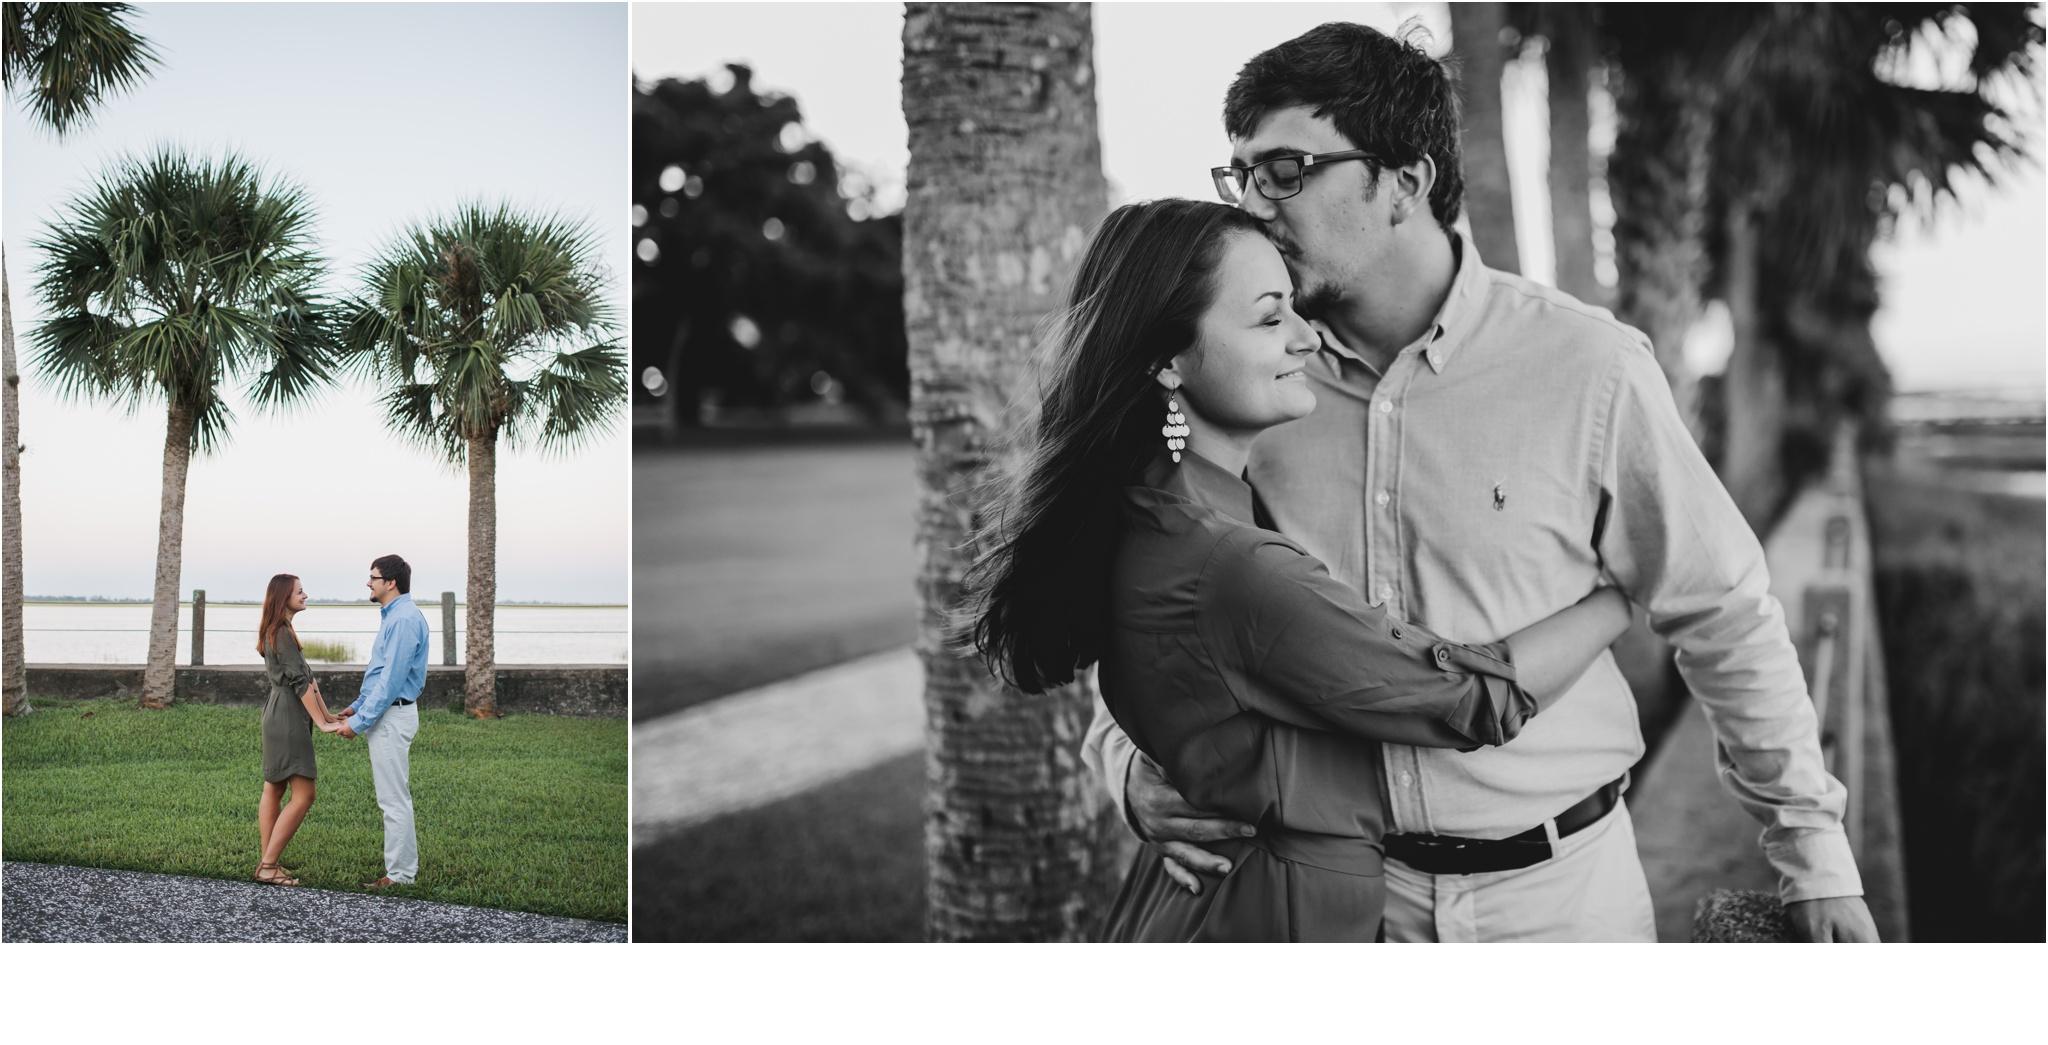 Rainey_Gregg_Photography_St._Simons_Island_Georgia_California_Wedding_Portrait_Photography_1374.jpg